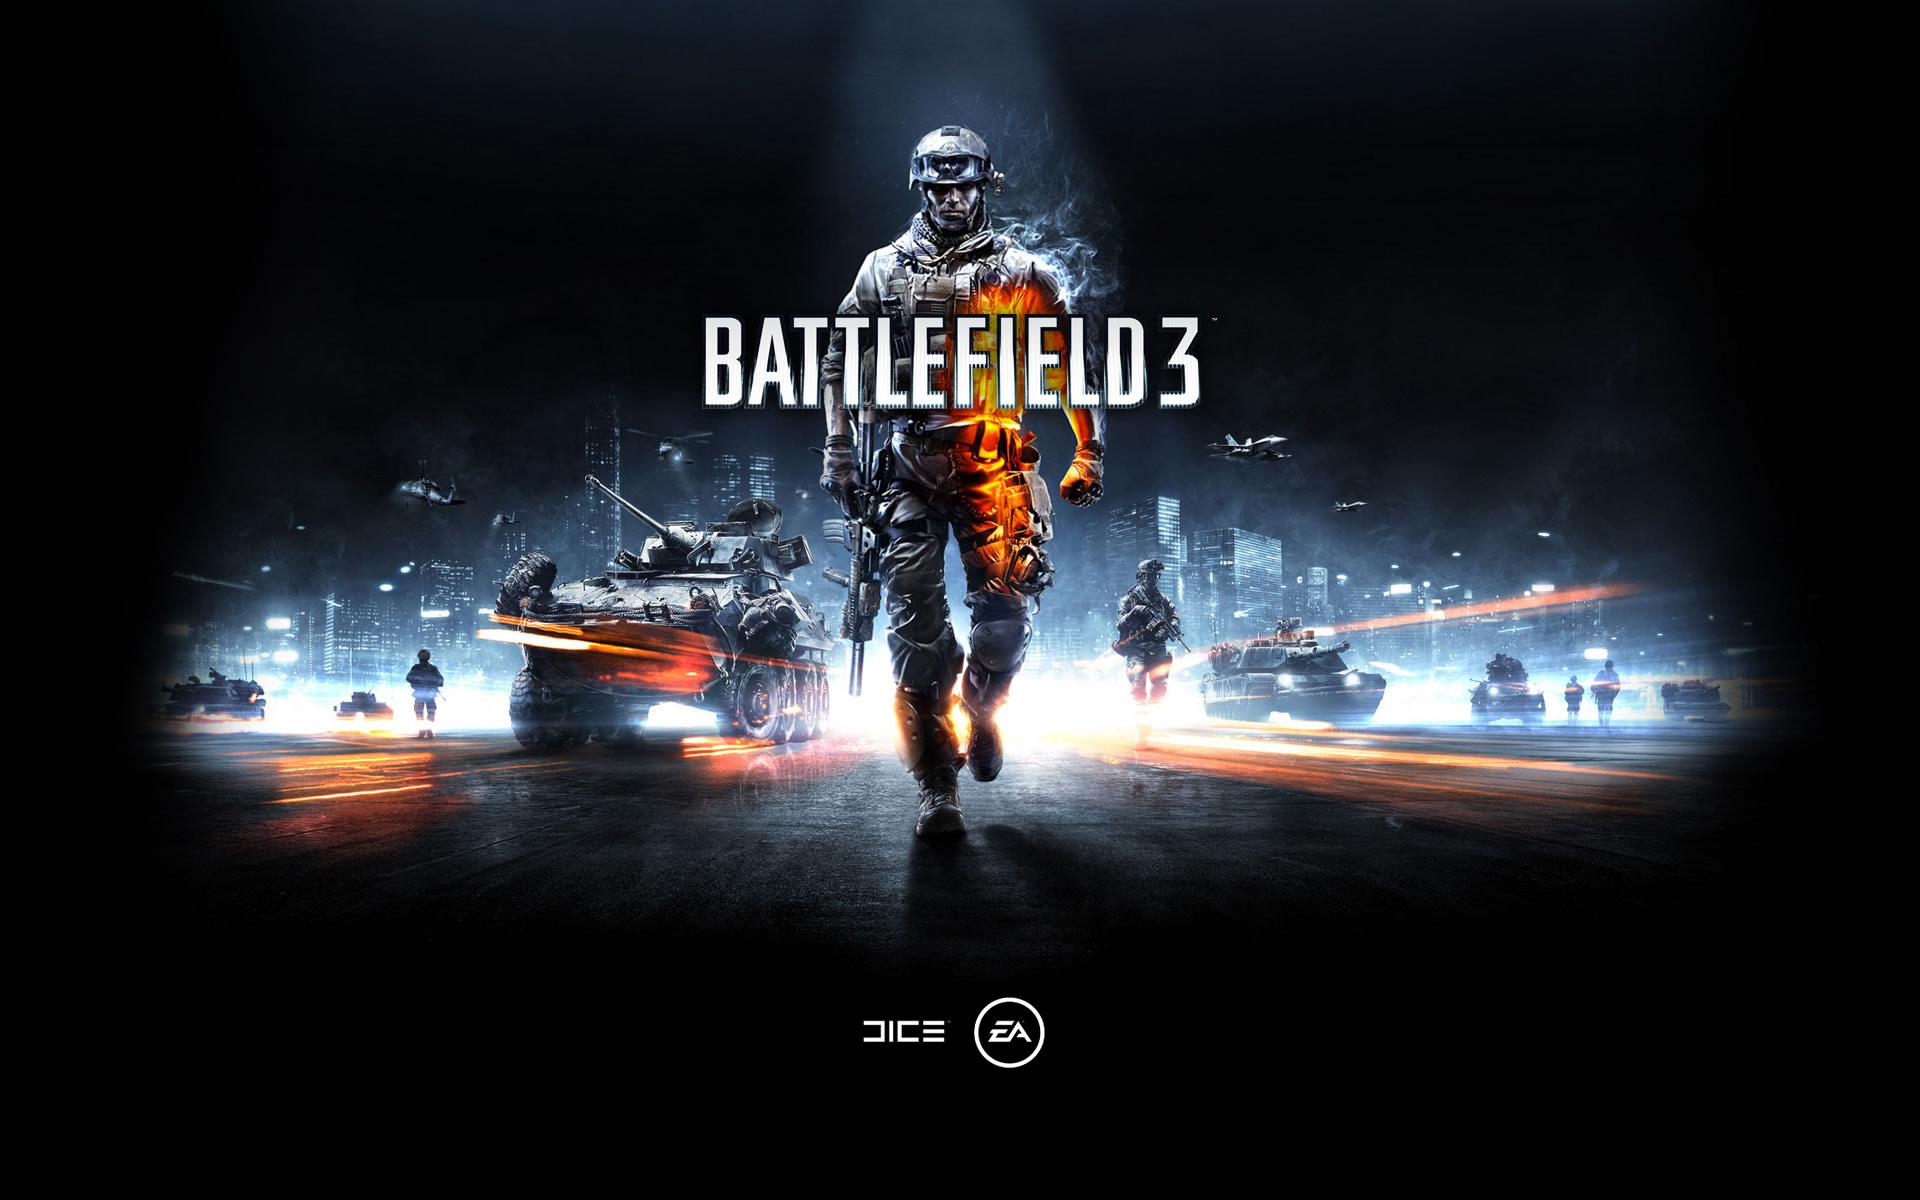 Battlefield 3 HD Wallpaper Hd Wallpaper 1920x1200